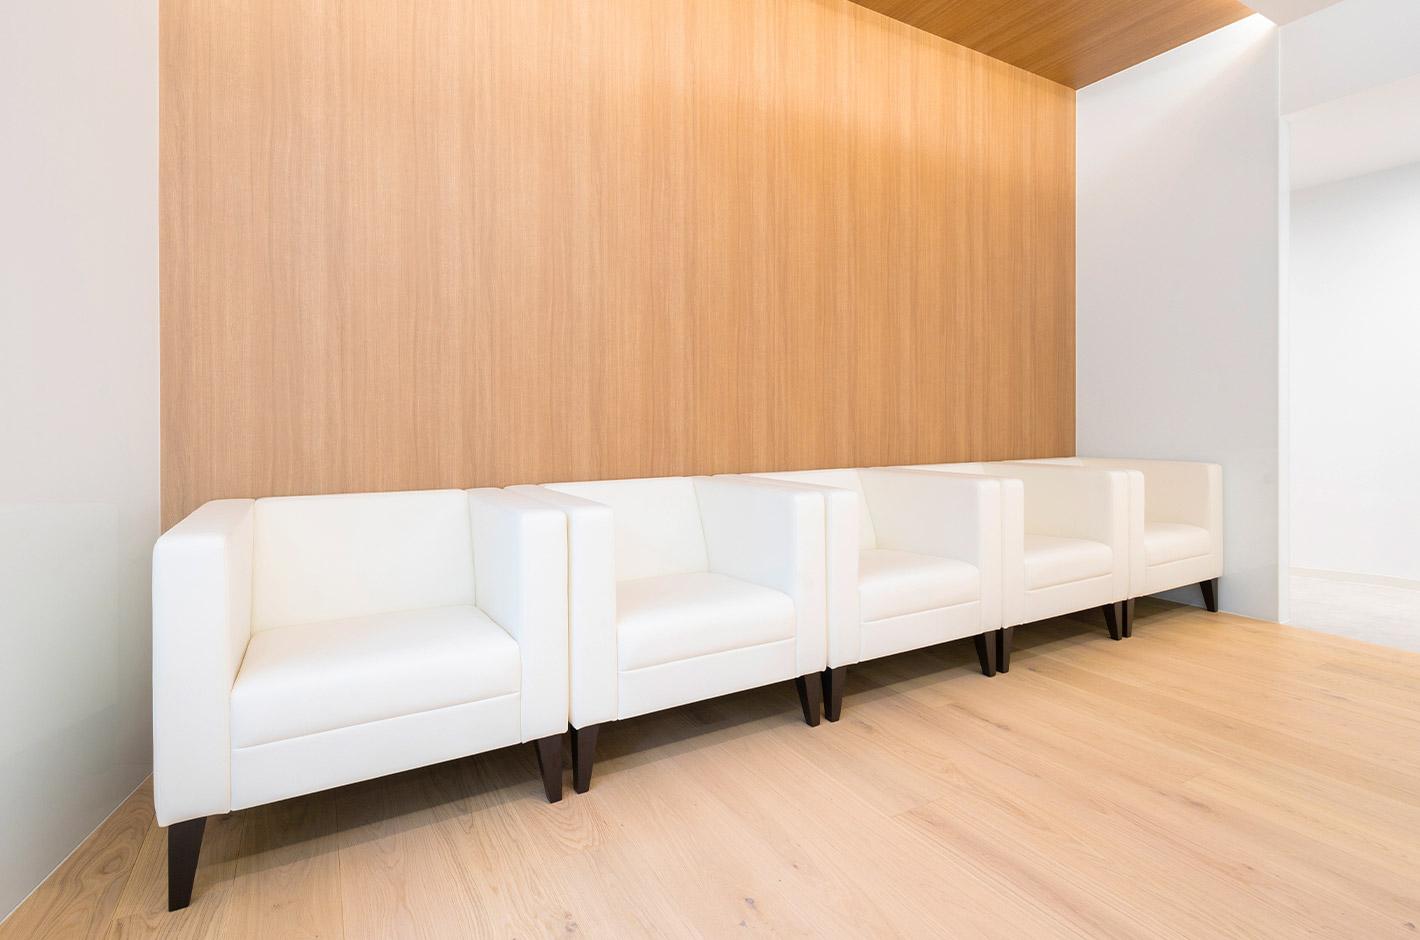 Dクリニック新宿の待合室イメージ